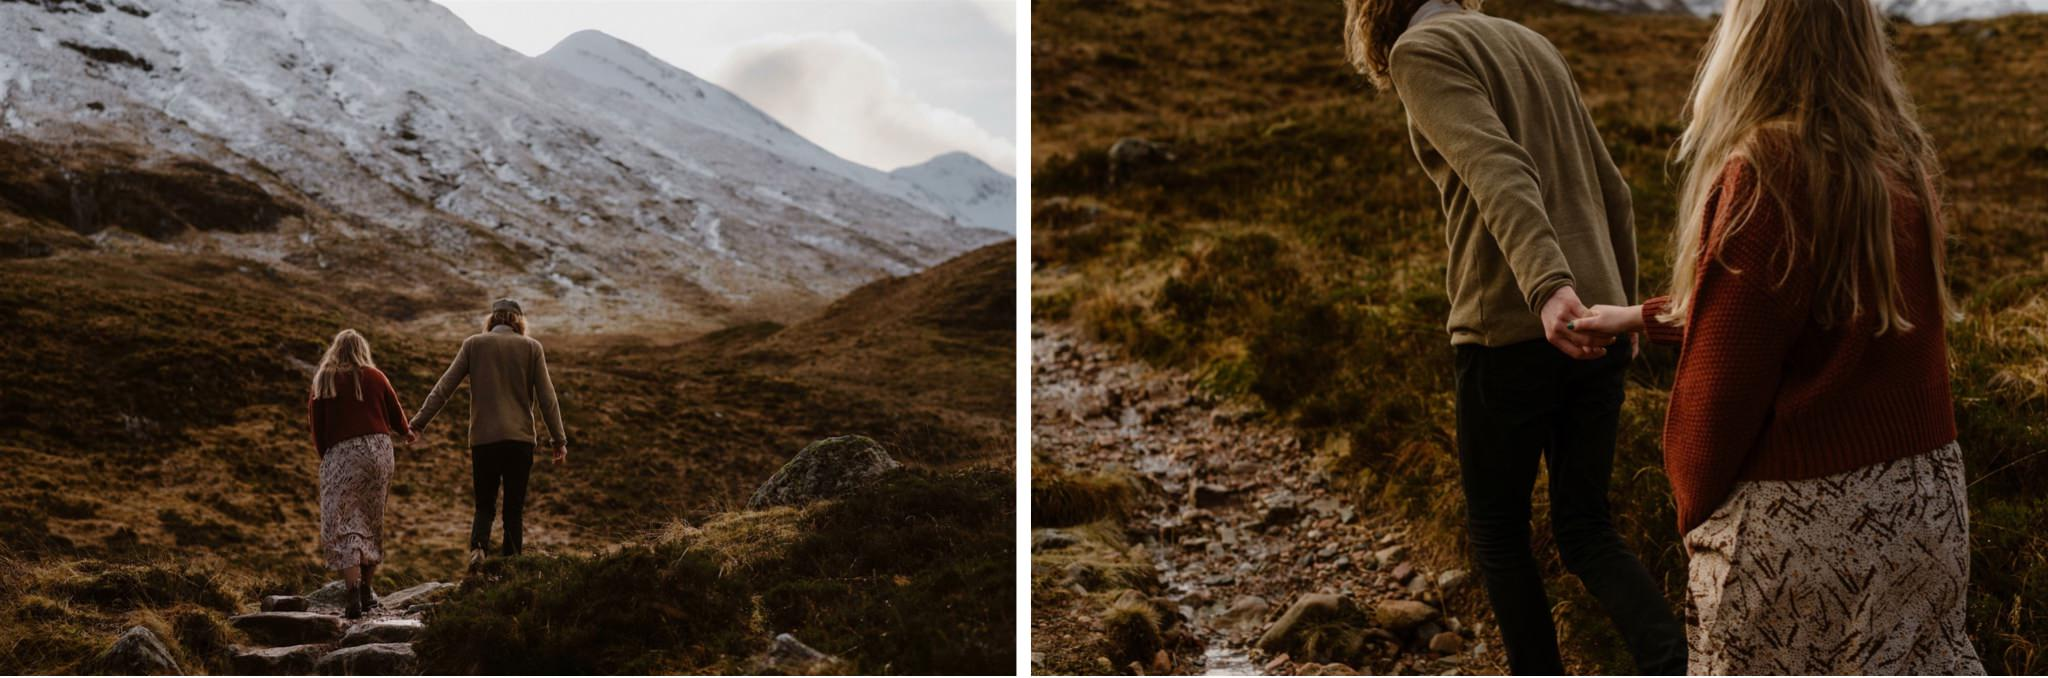 Eloping in Scotland Scottish elopement photographers wedding